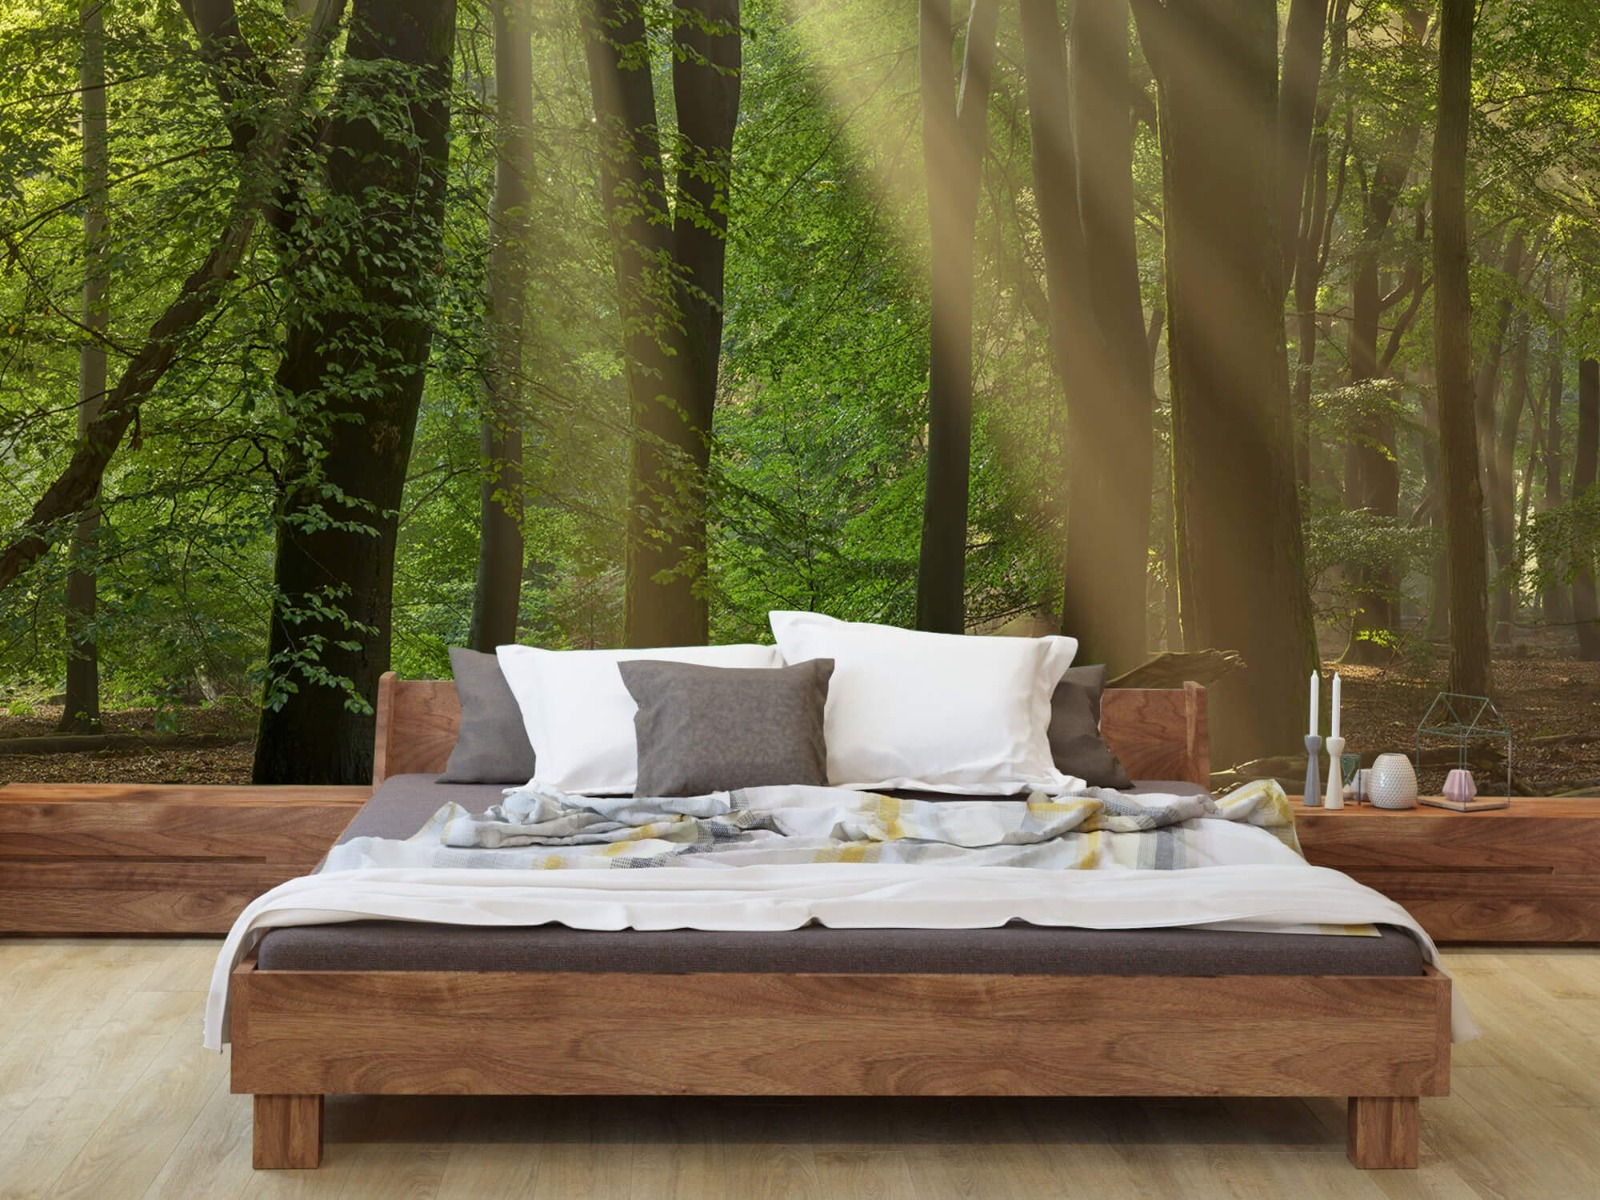 Bomen - Zonneharpen in het bos - Slaapkamer 9